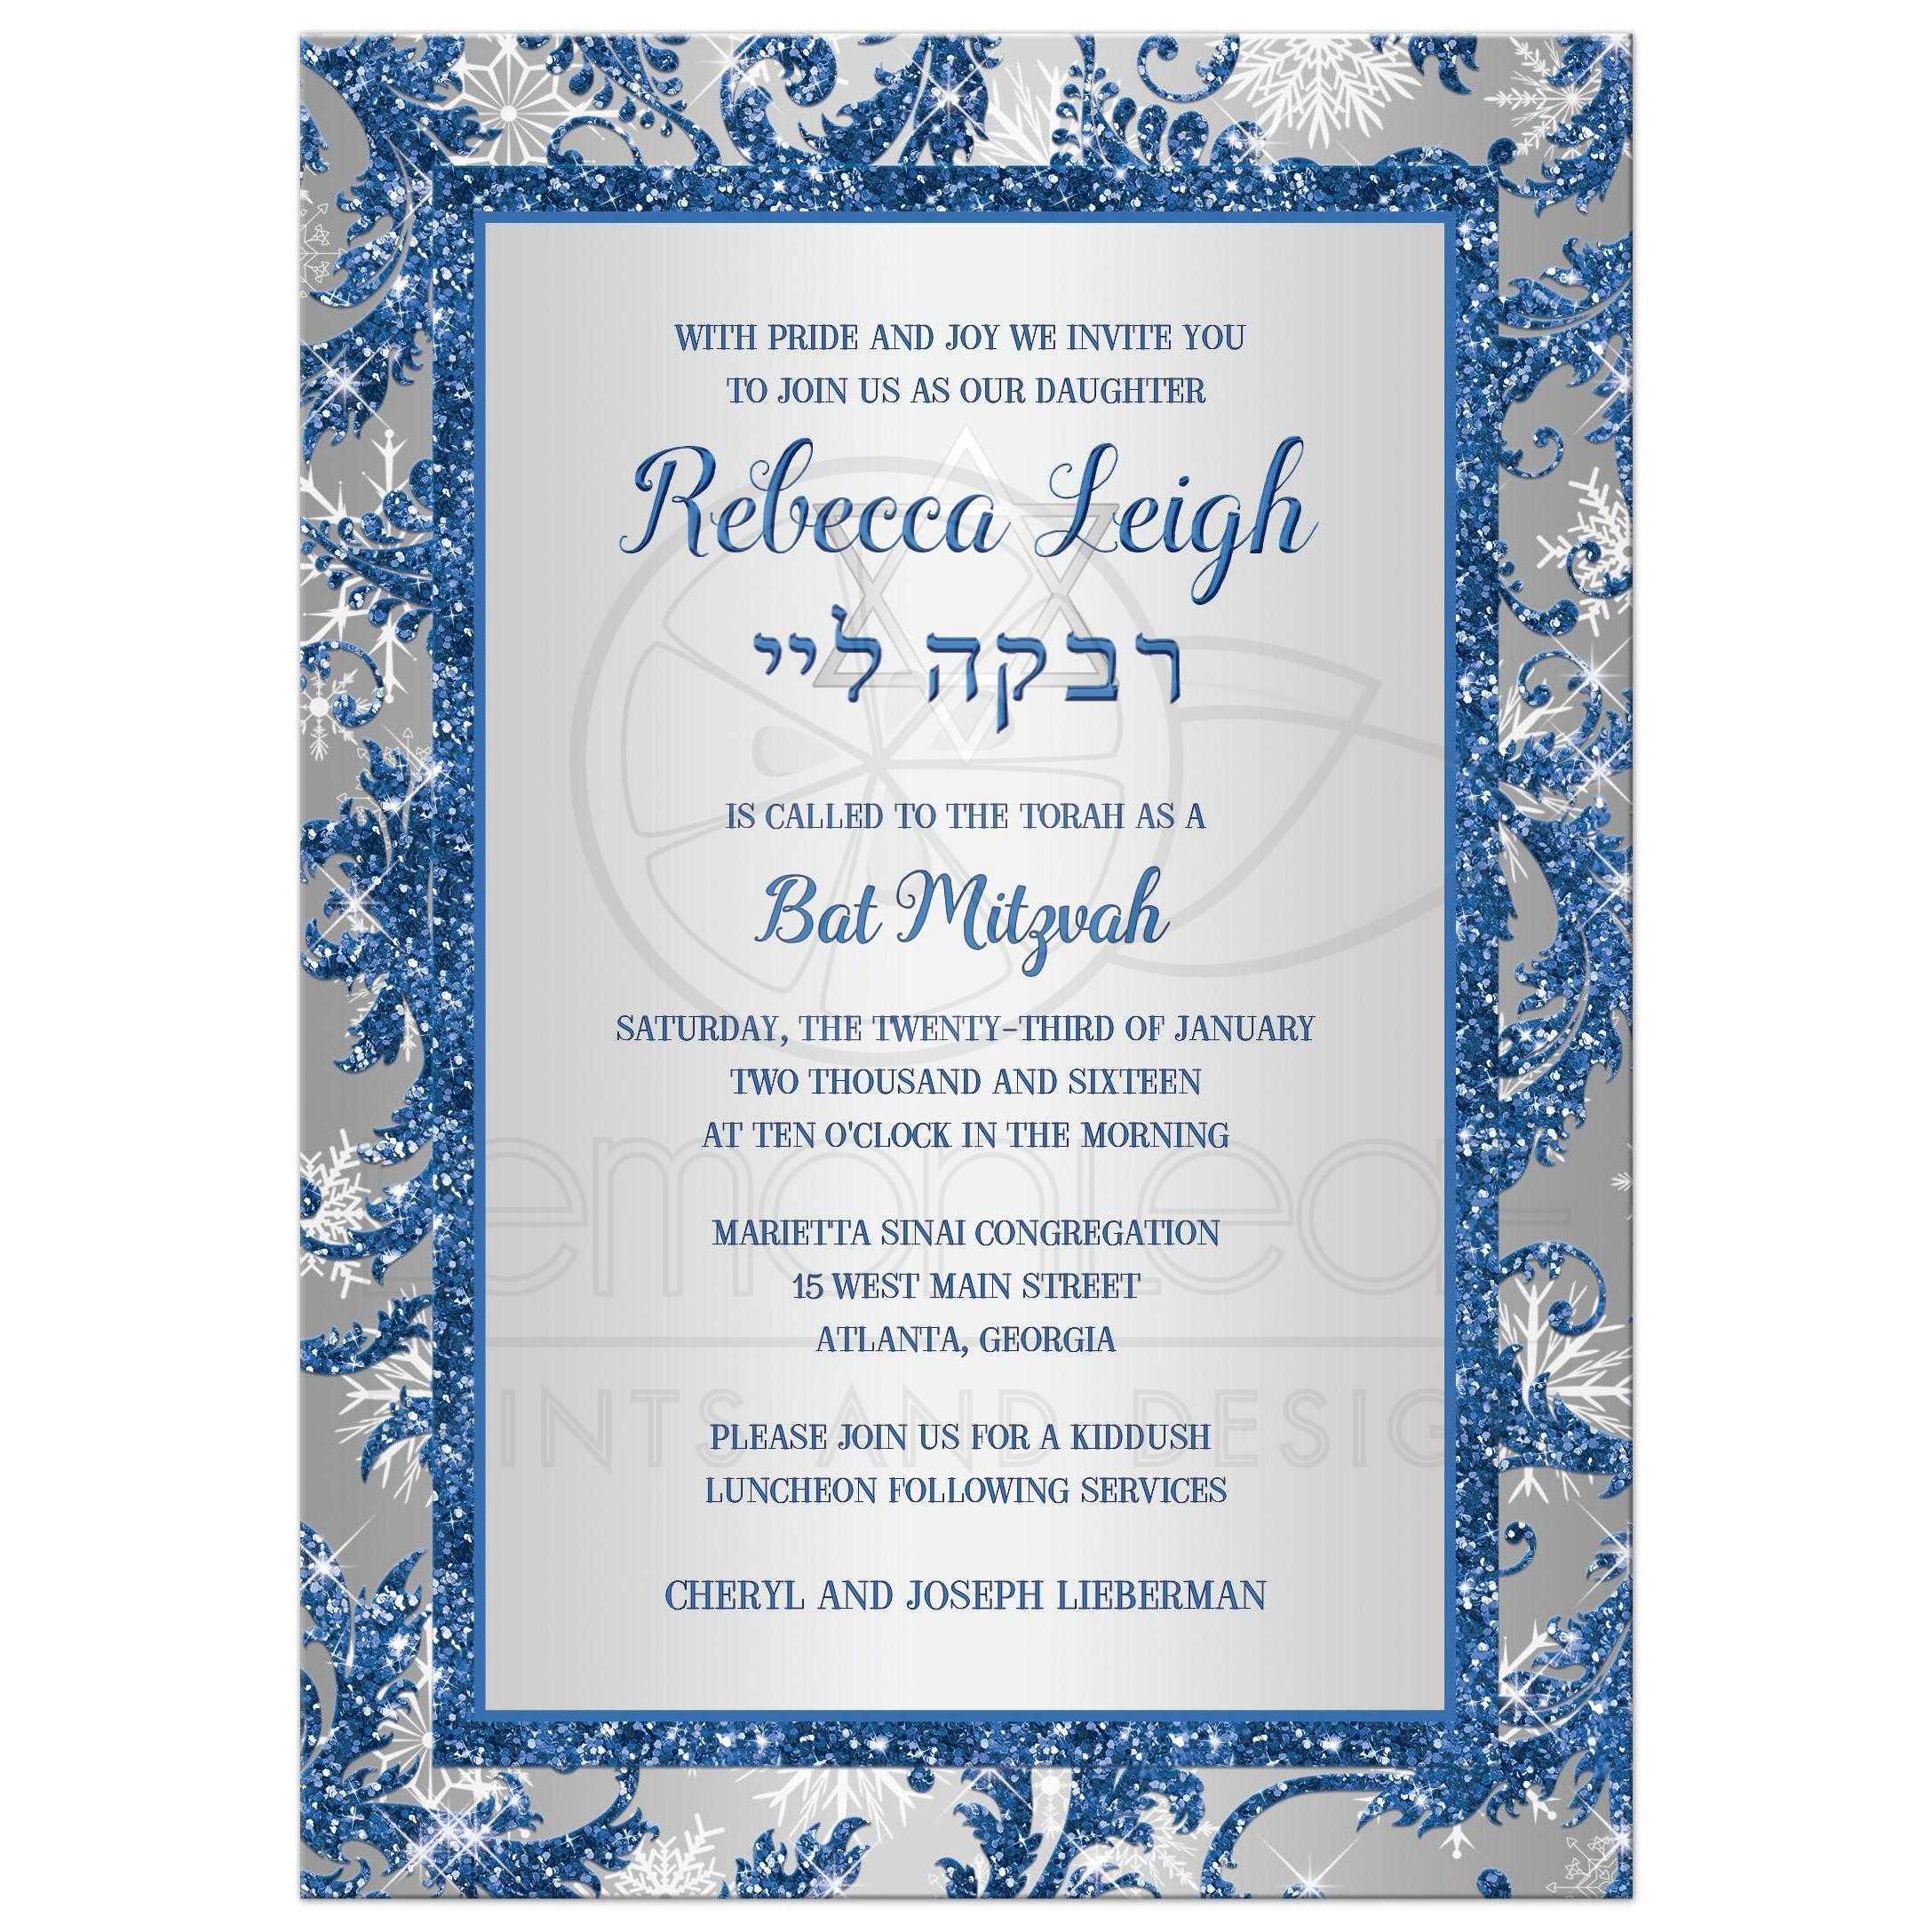 Winter Wonderland Bat Mitzvah Invitation | Royal Blue, Silver ...